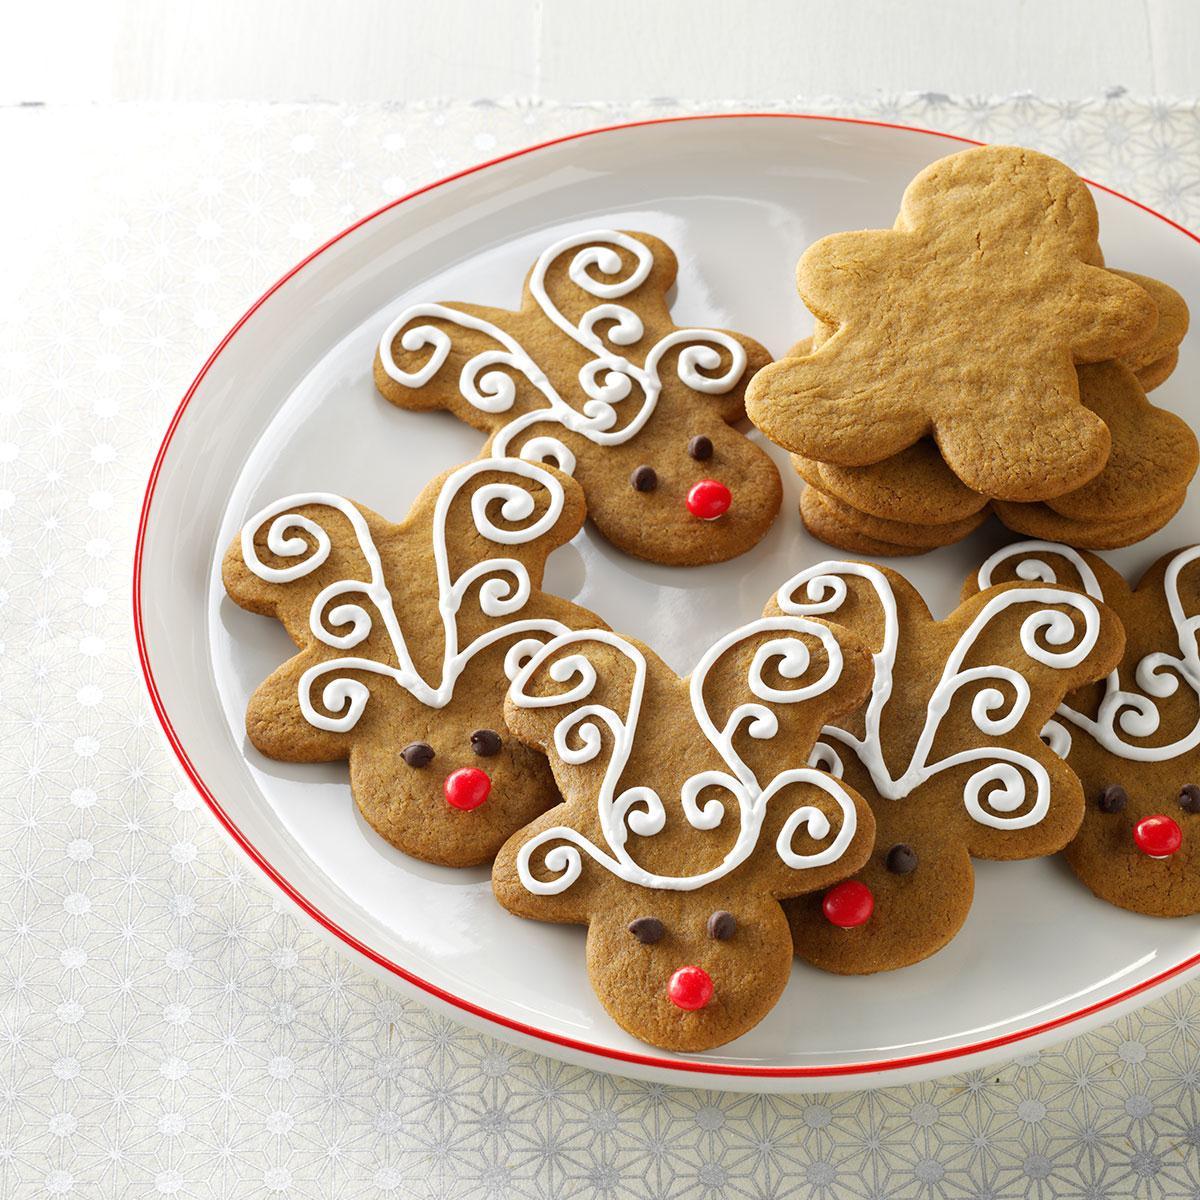 Jolly Ginger Reindeer Cookies Recipe